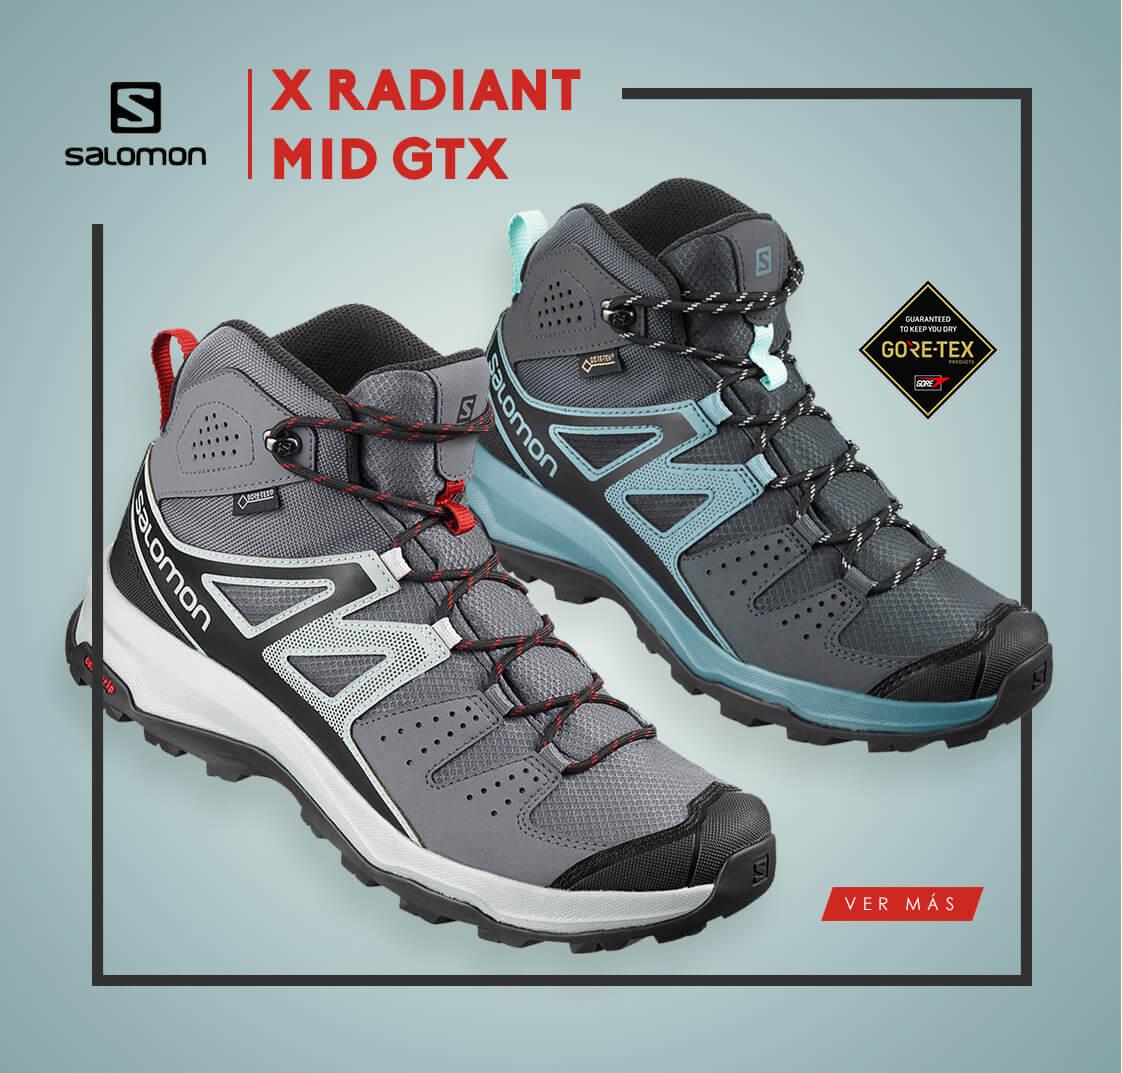 Botas Salomon X Radiant Mid GTX